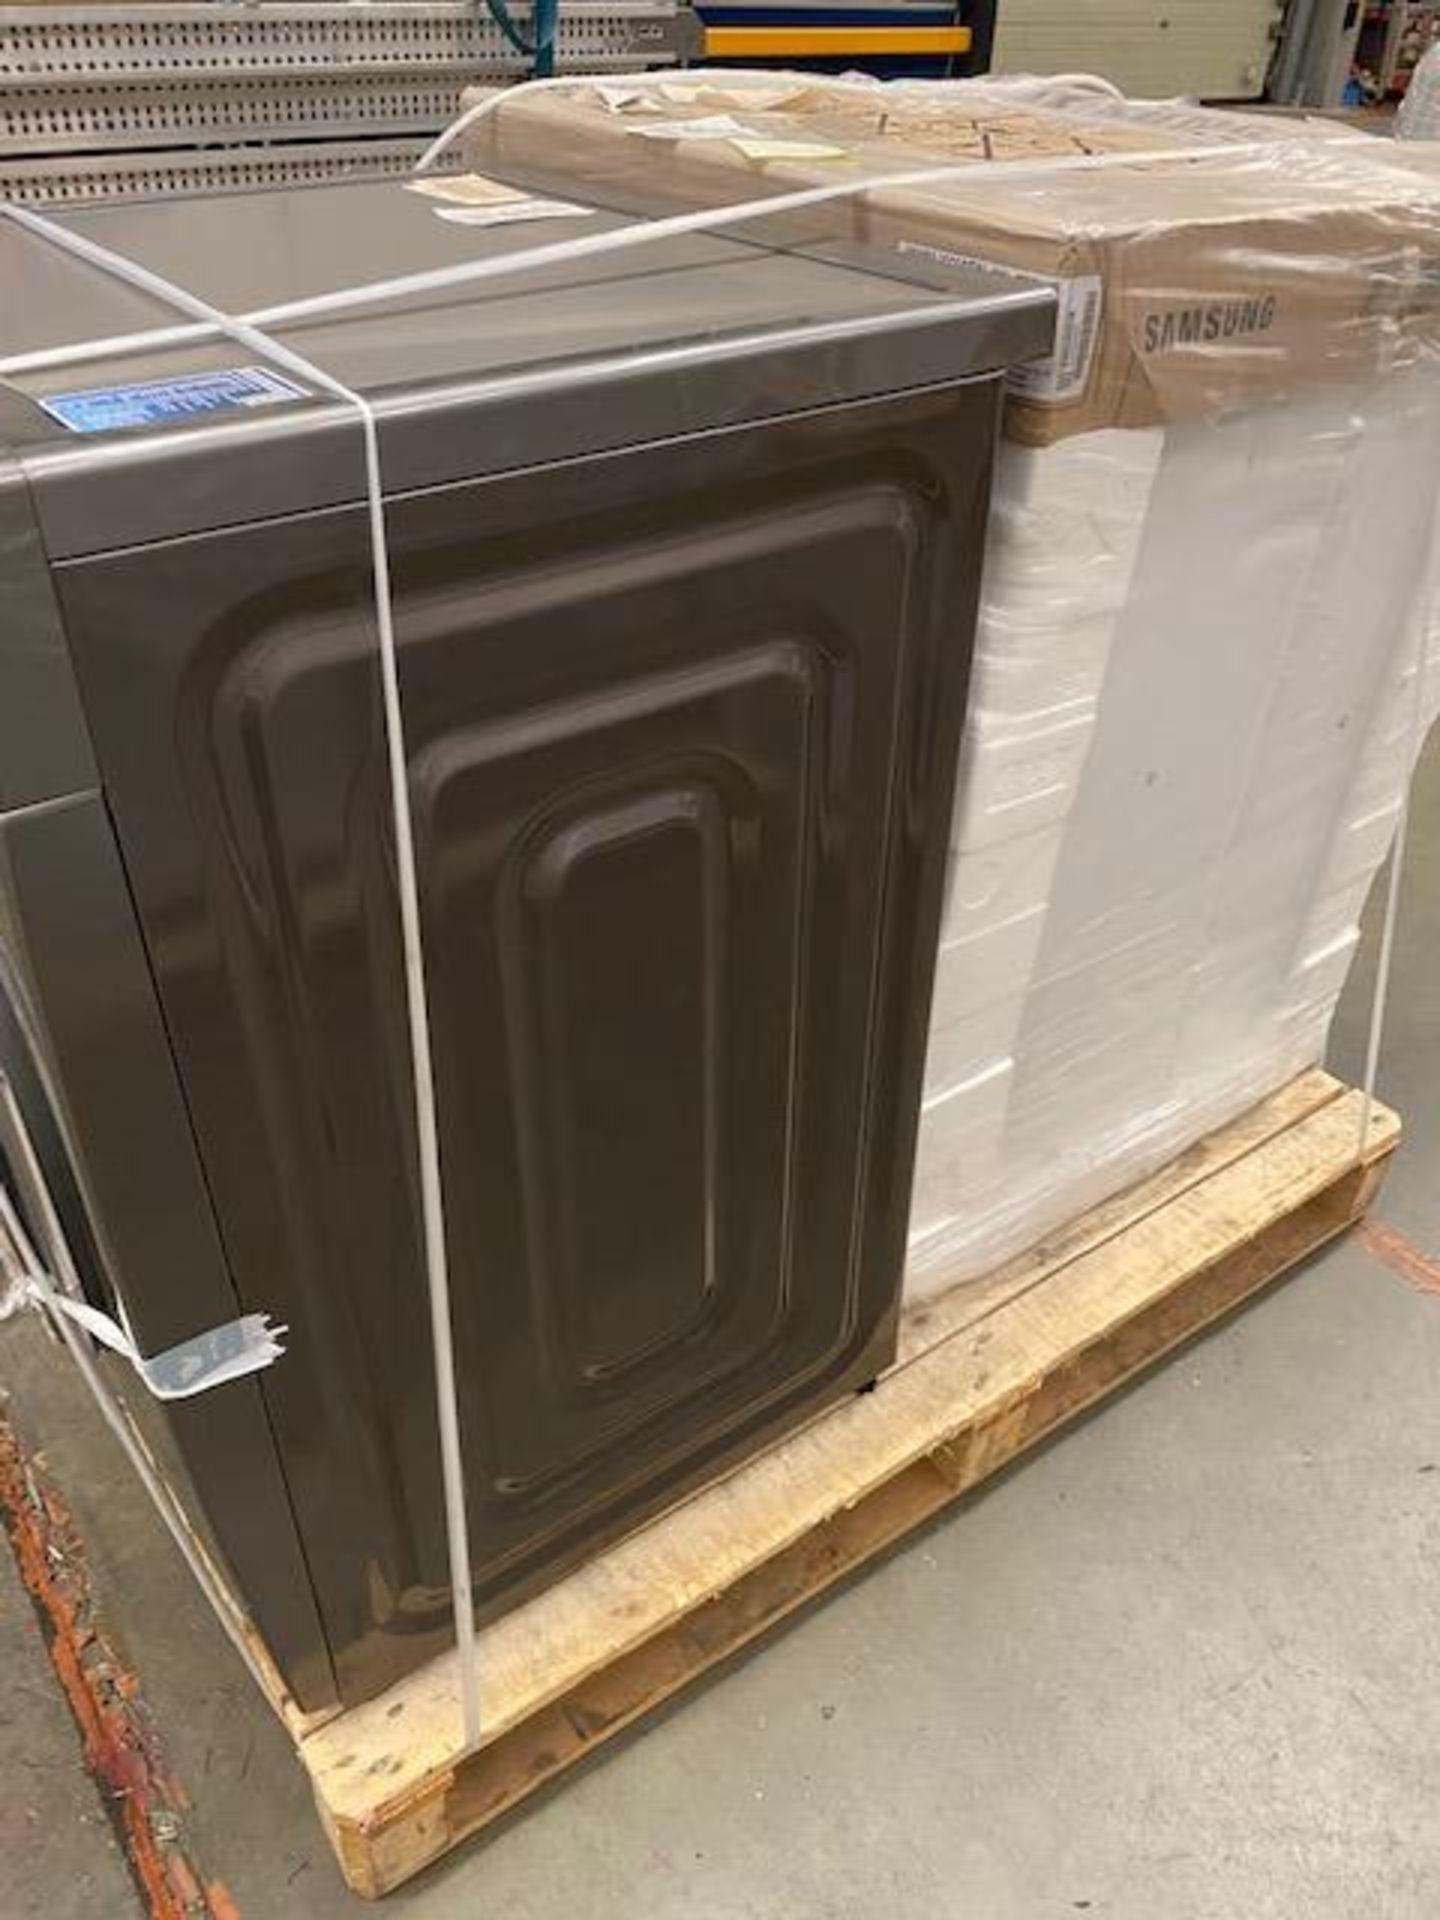 Pallet of 2 Samsung Premium Washing machines. Total Latest selling price £678* - Image 7 of 9